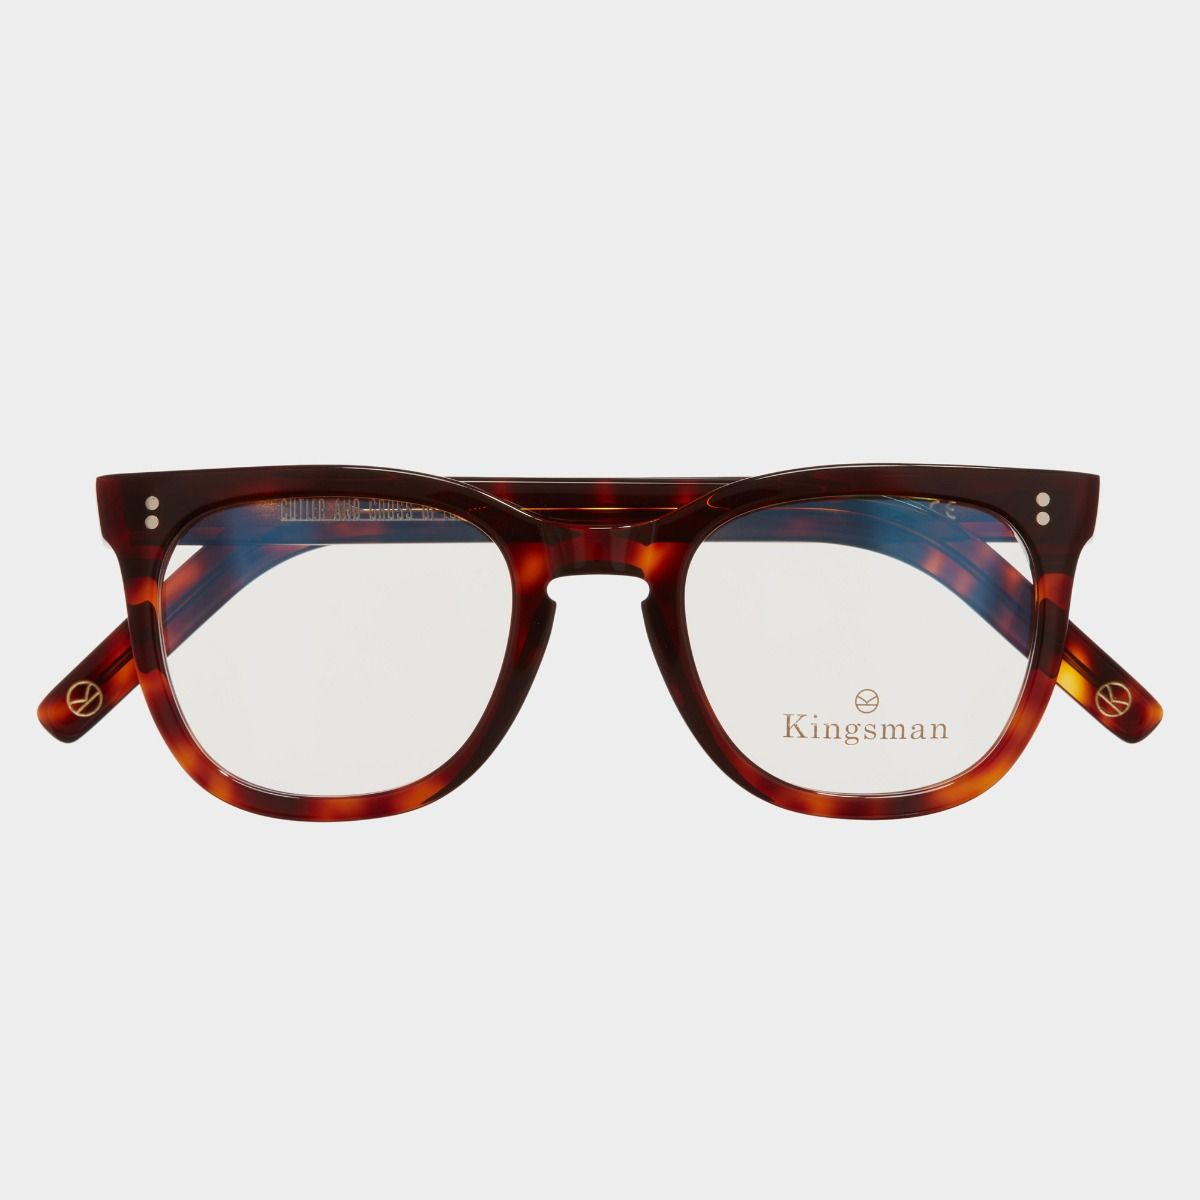 0824 Kingsman Optical Round Glasses